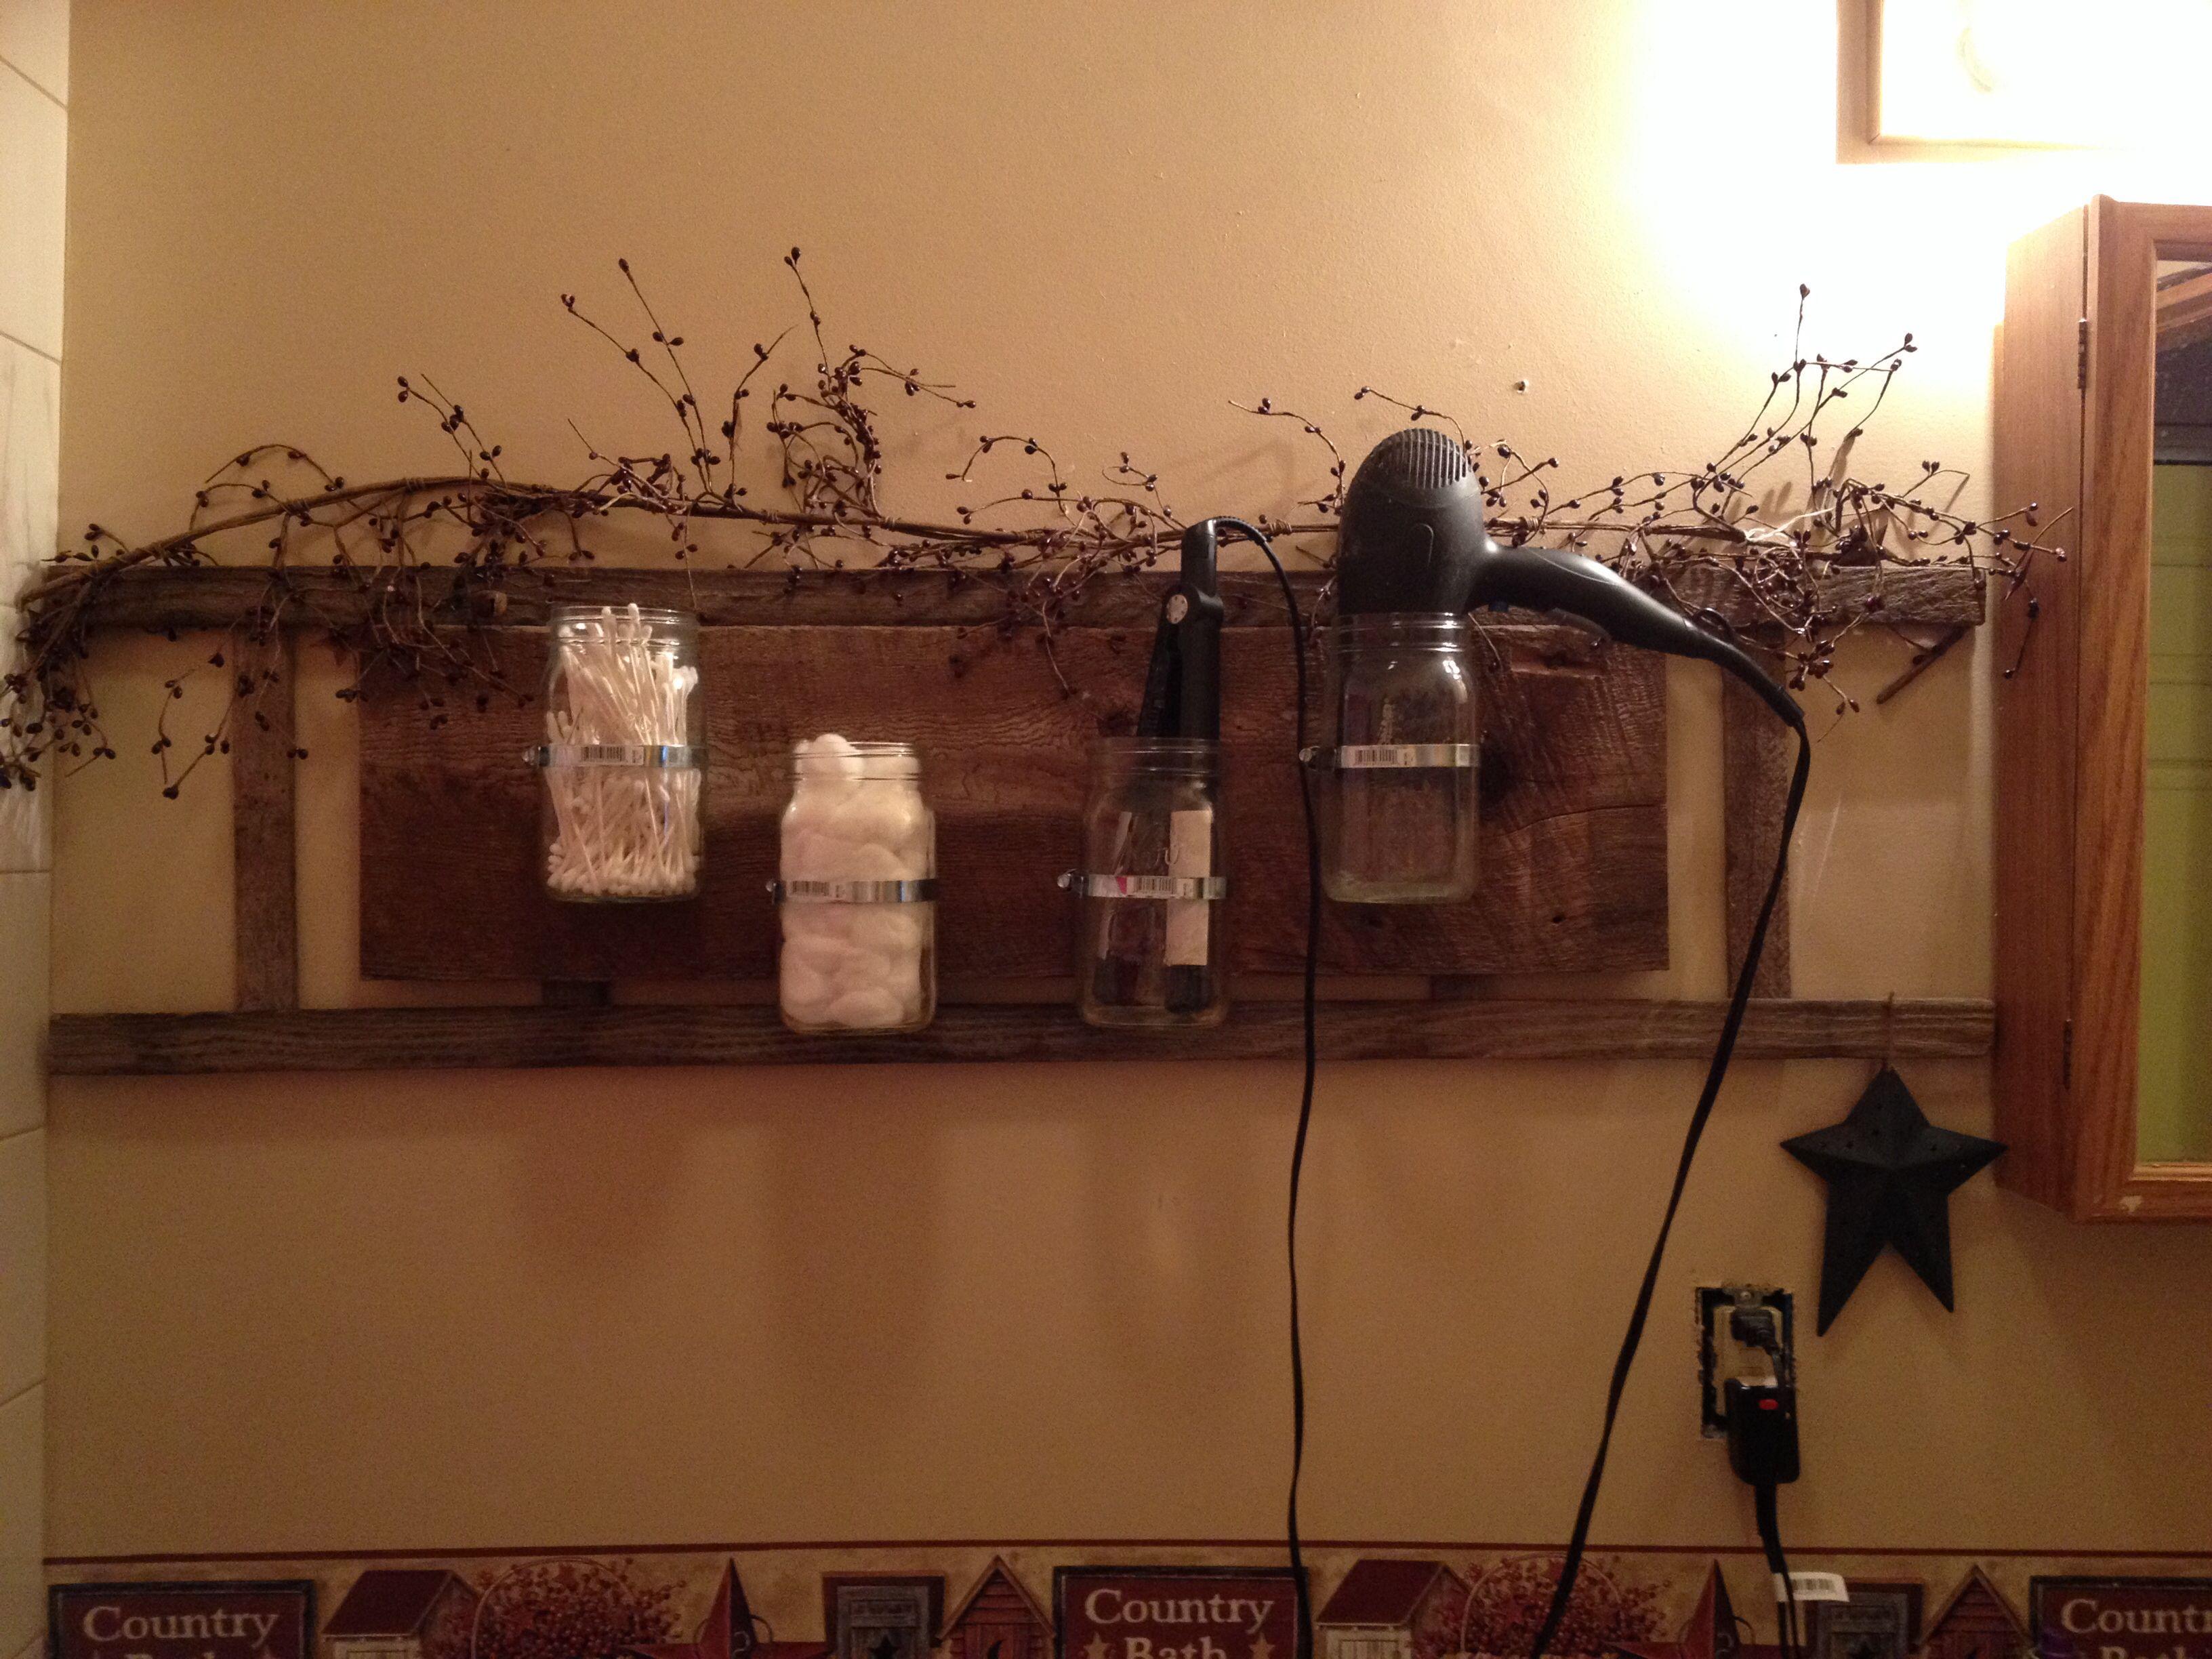 Q-tip, Cotton ball, hair dryer & flat iron holder I made!